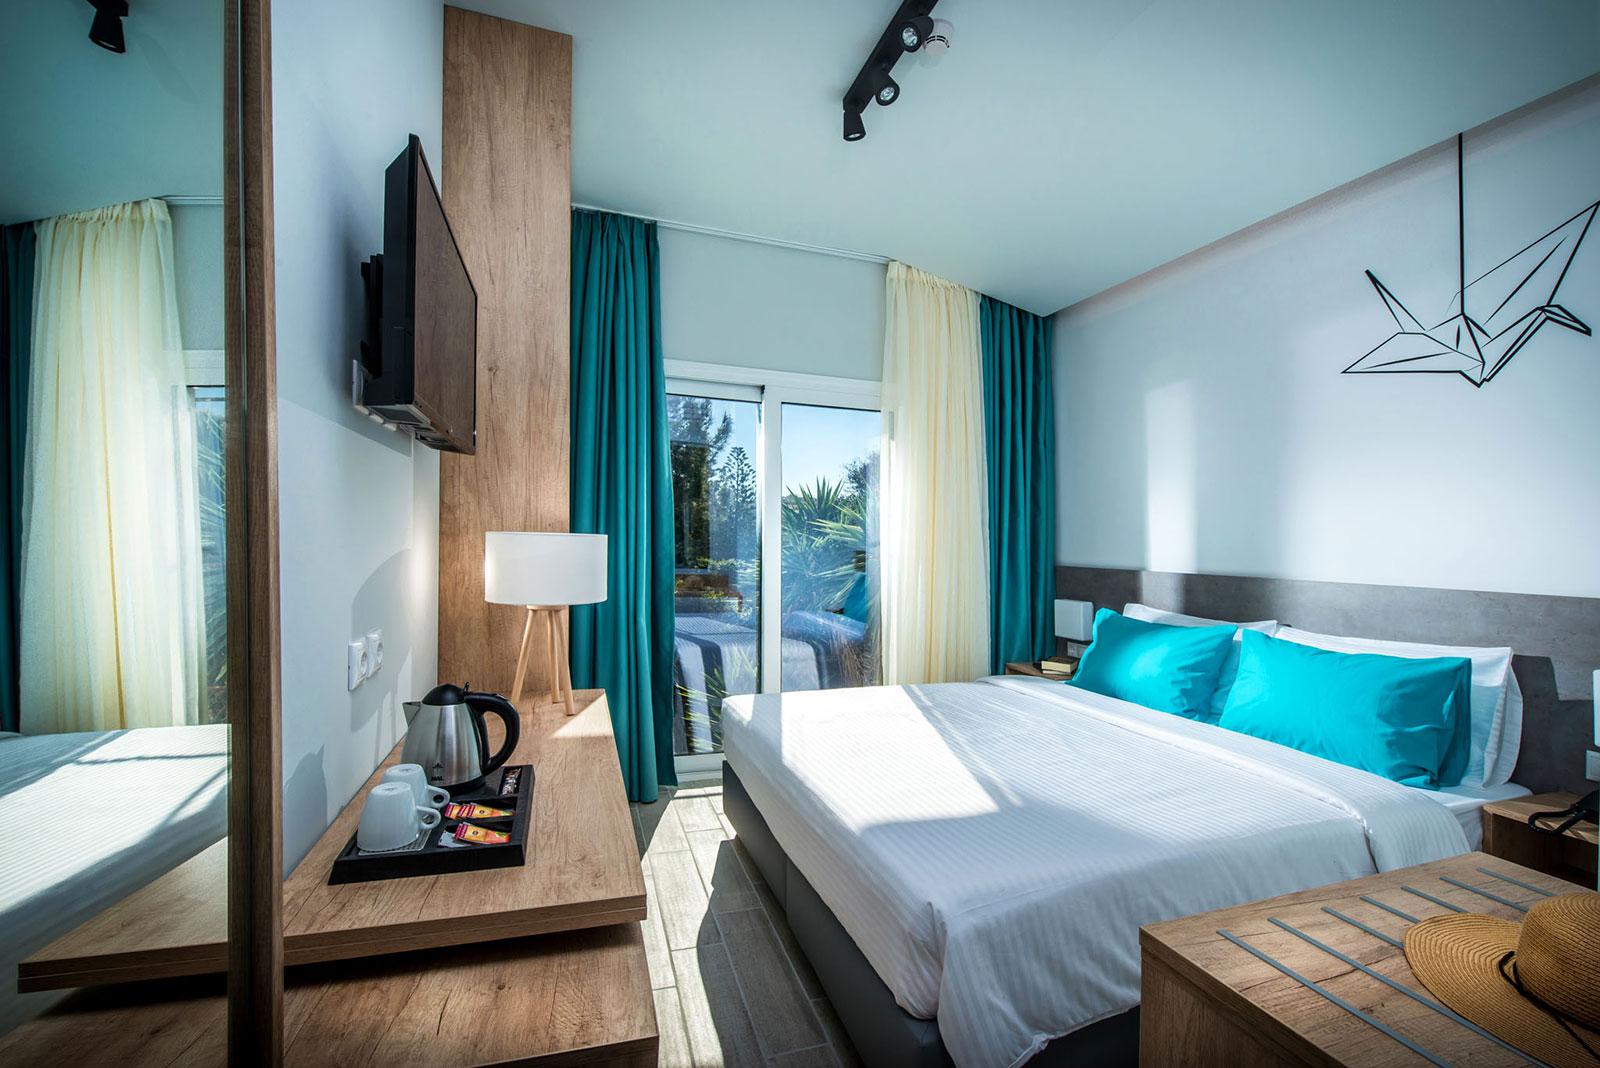 enorme lifestyle beach resort kreta